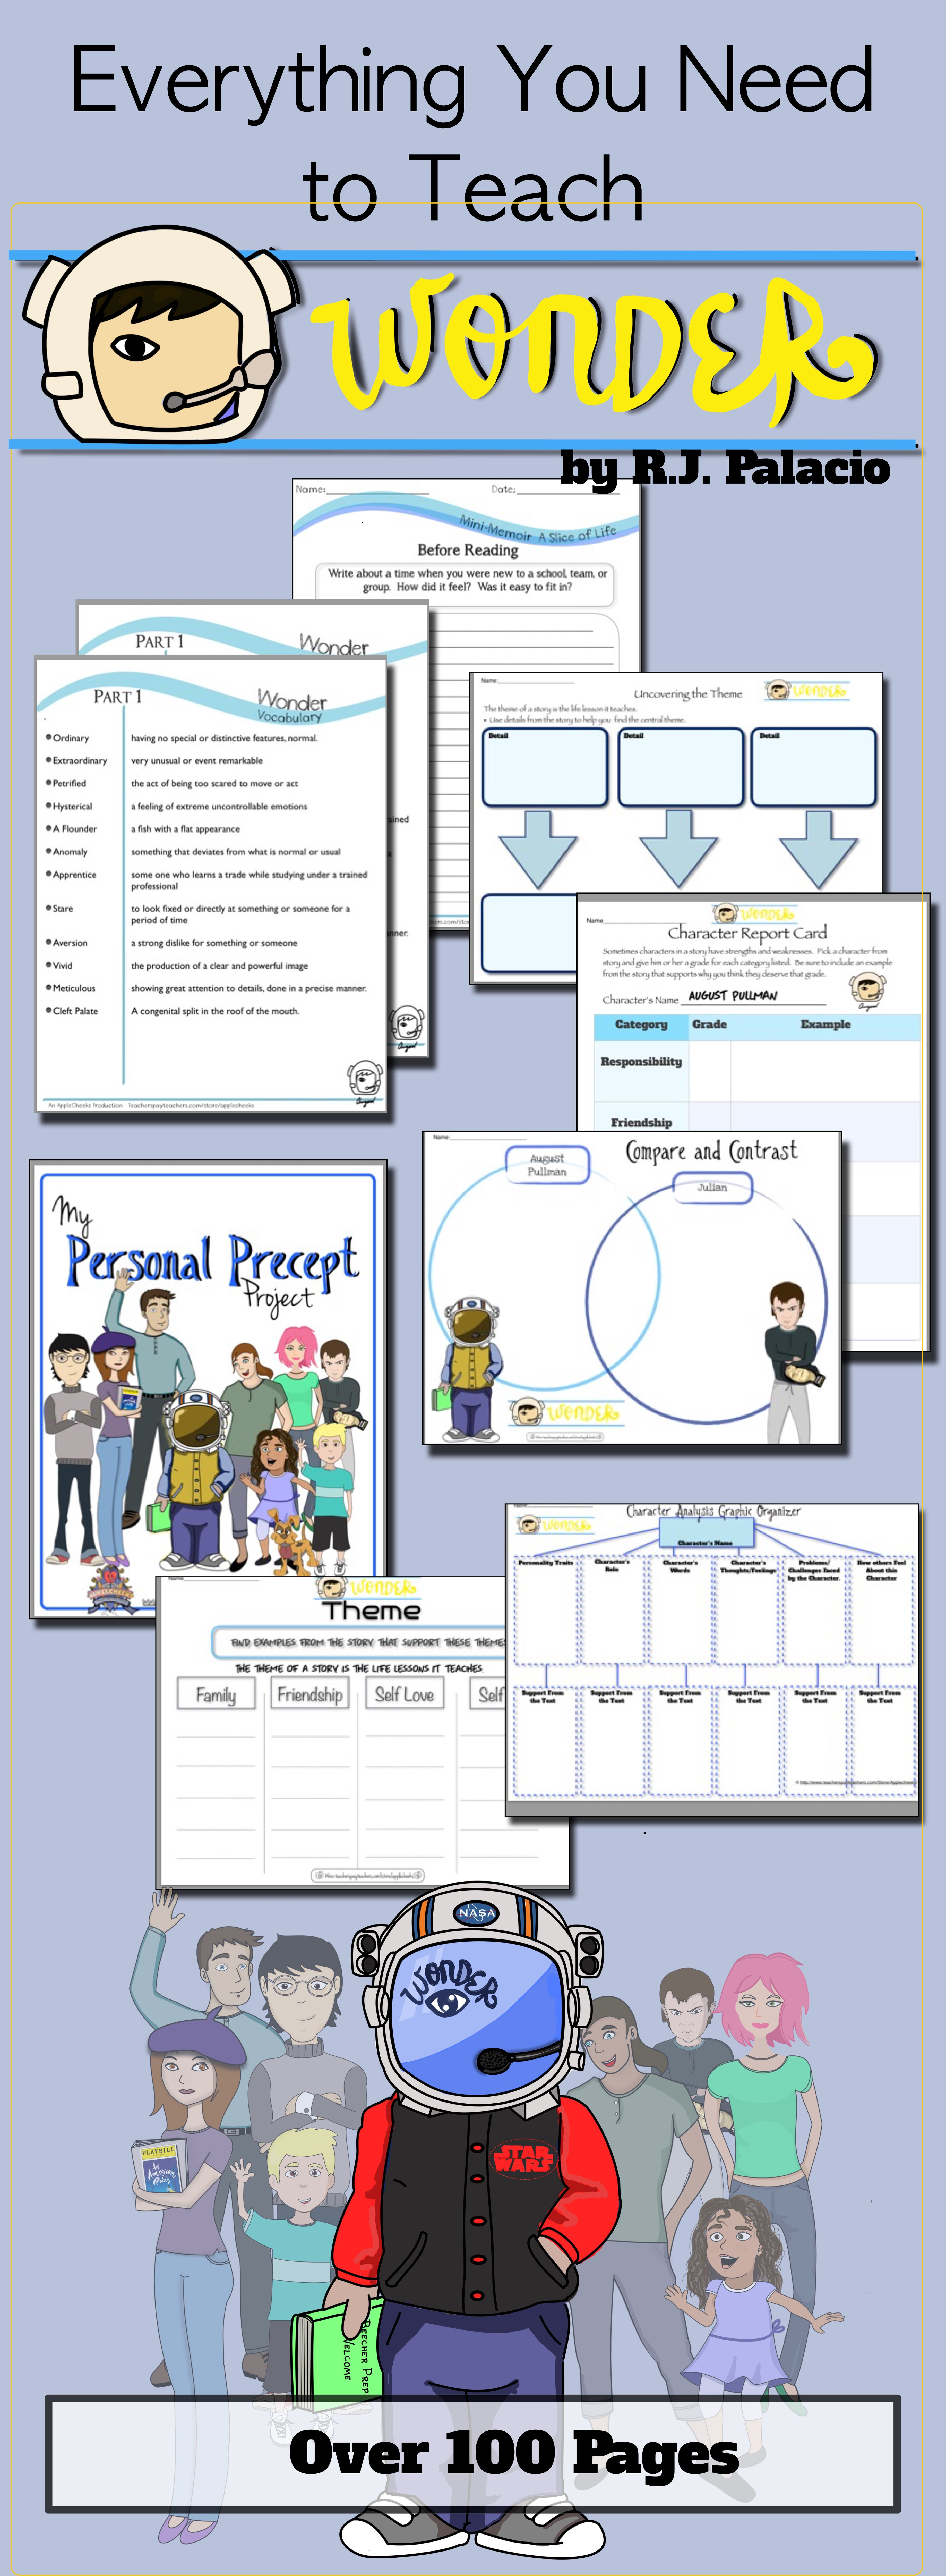 Wonder R J Palacio Complete Novel Study Top Product